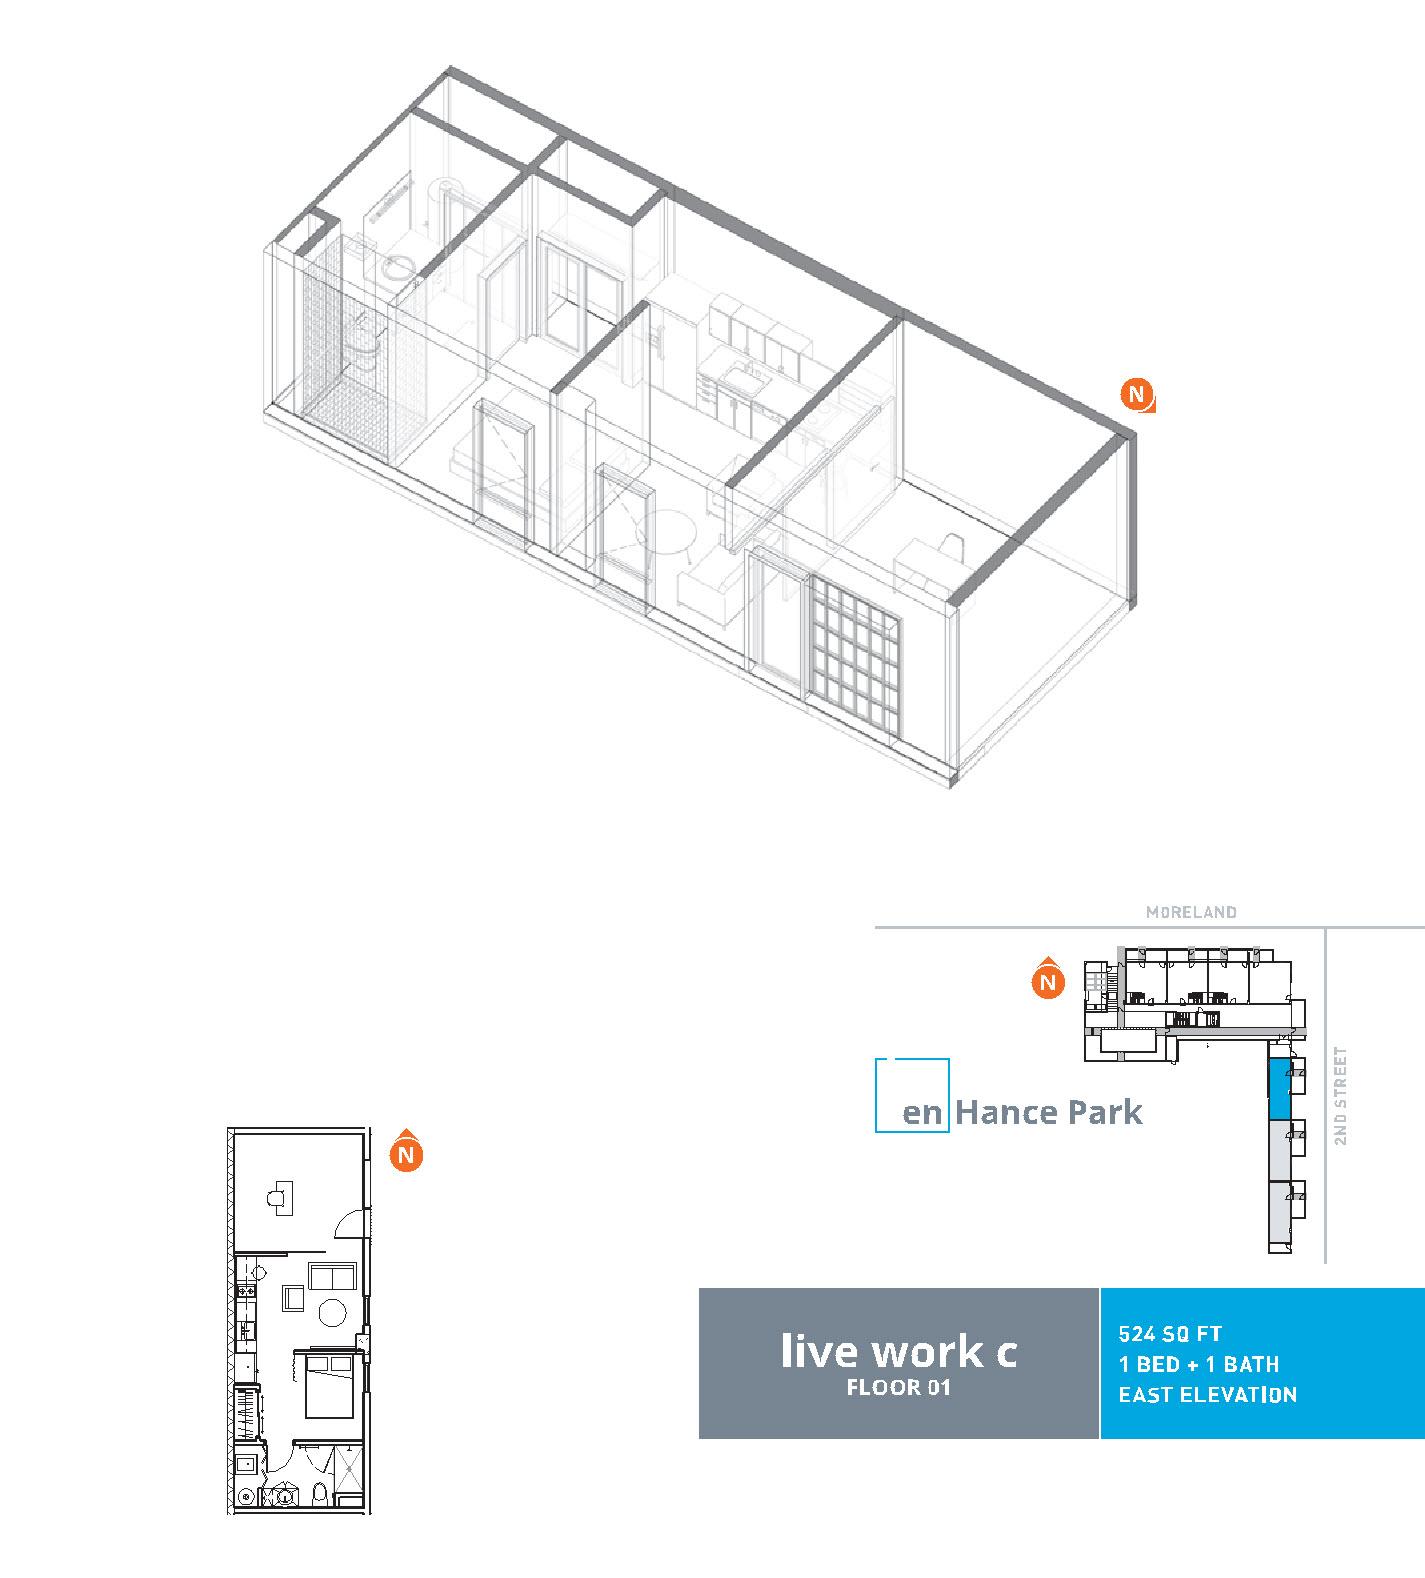 En hance park condo floor plan live work c 1bd